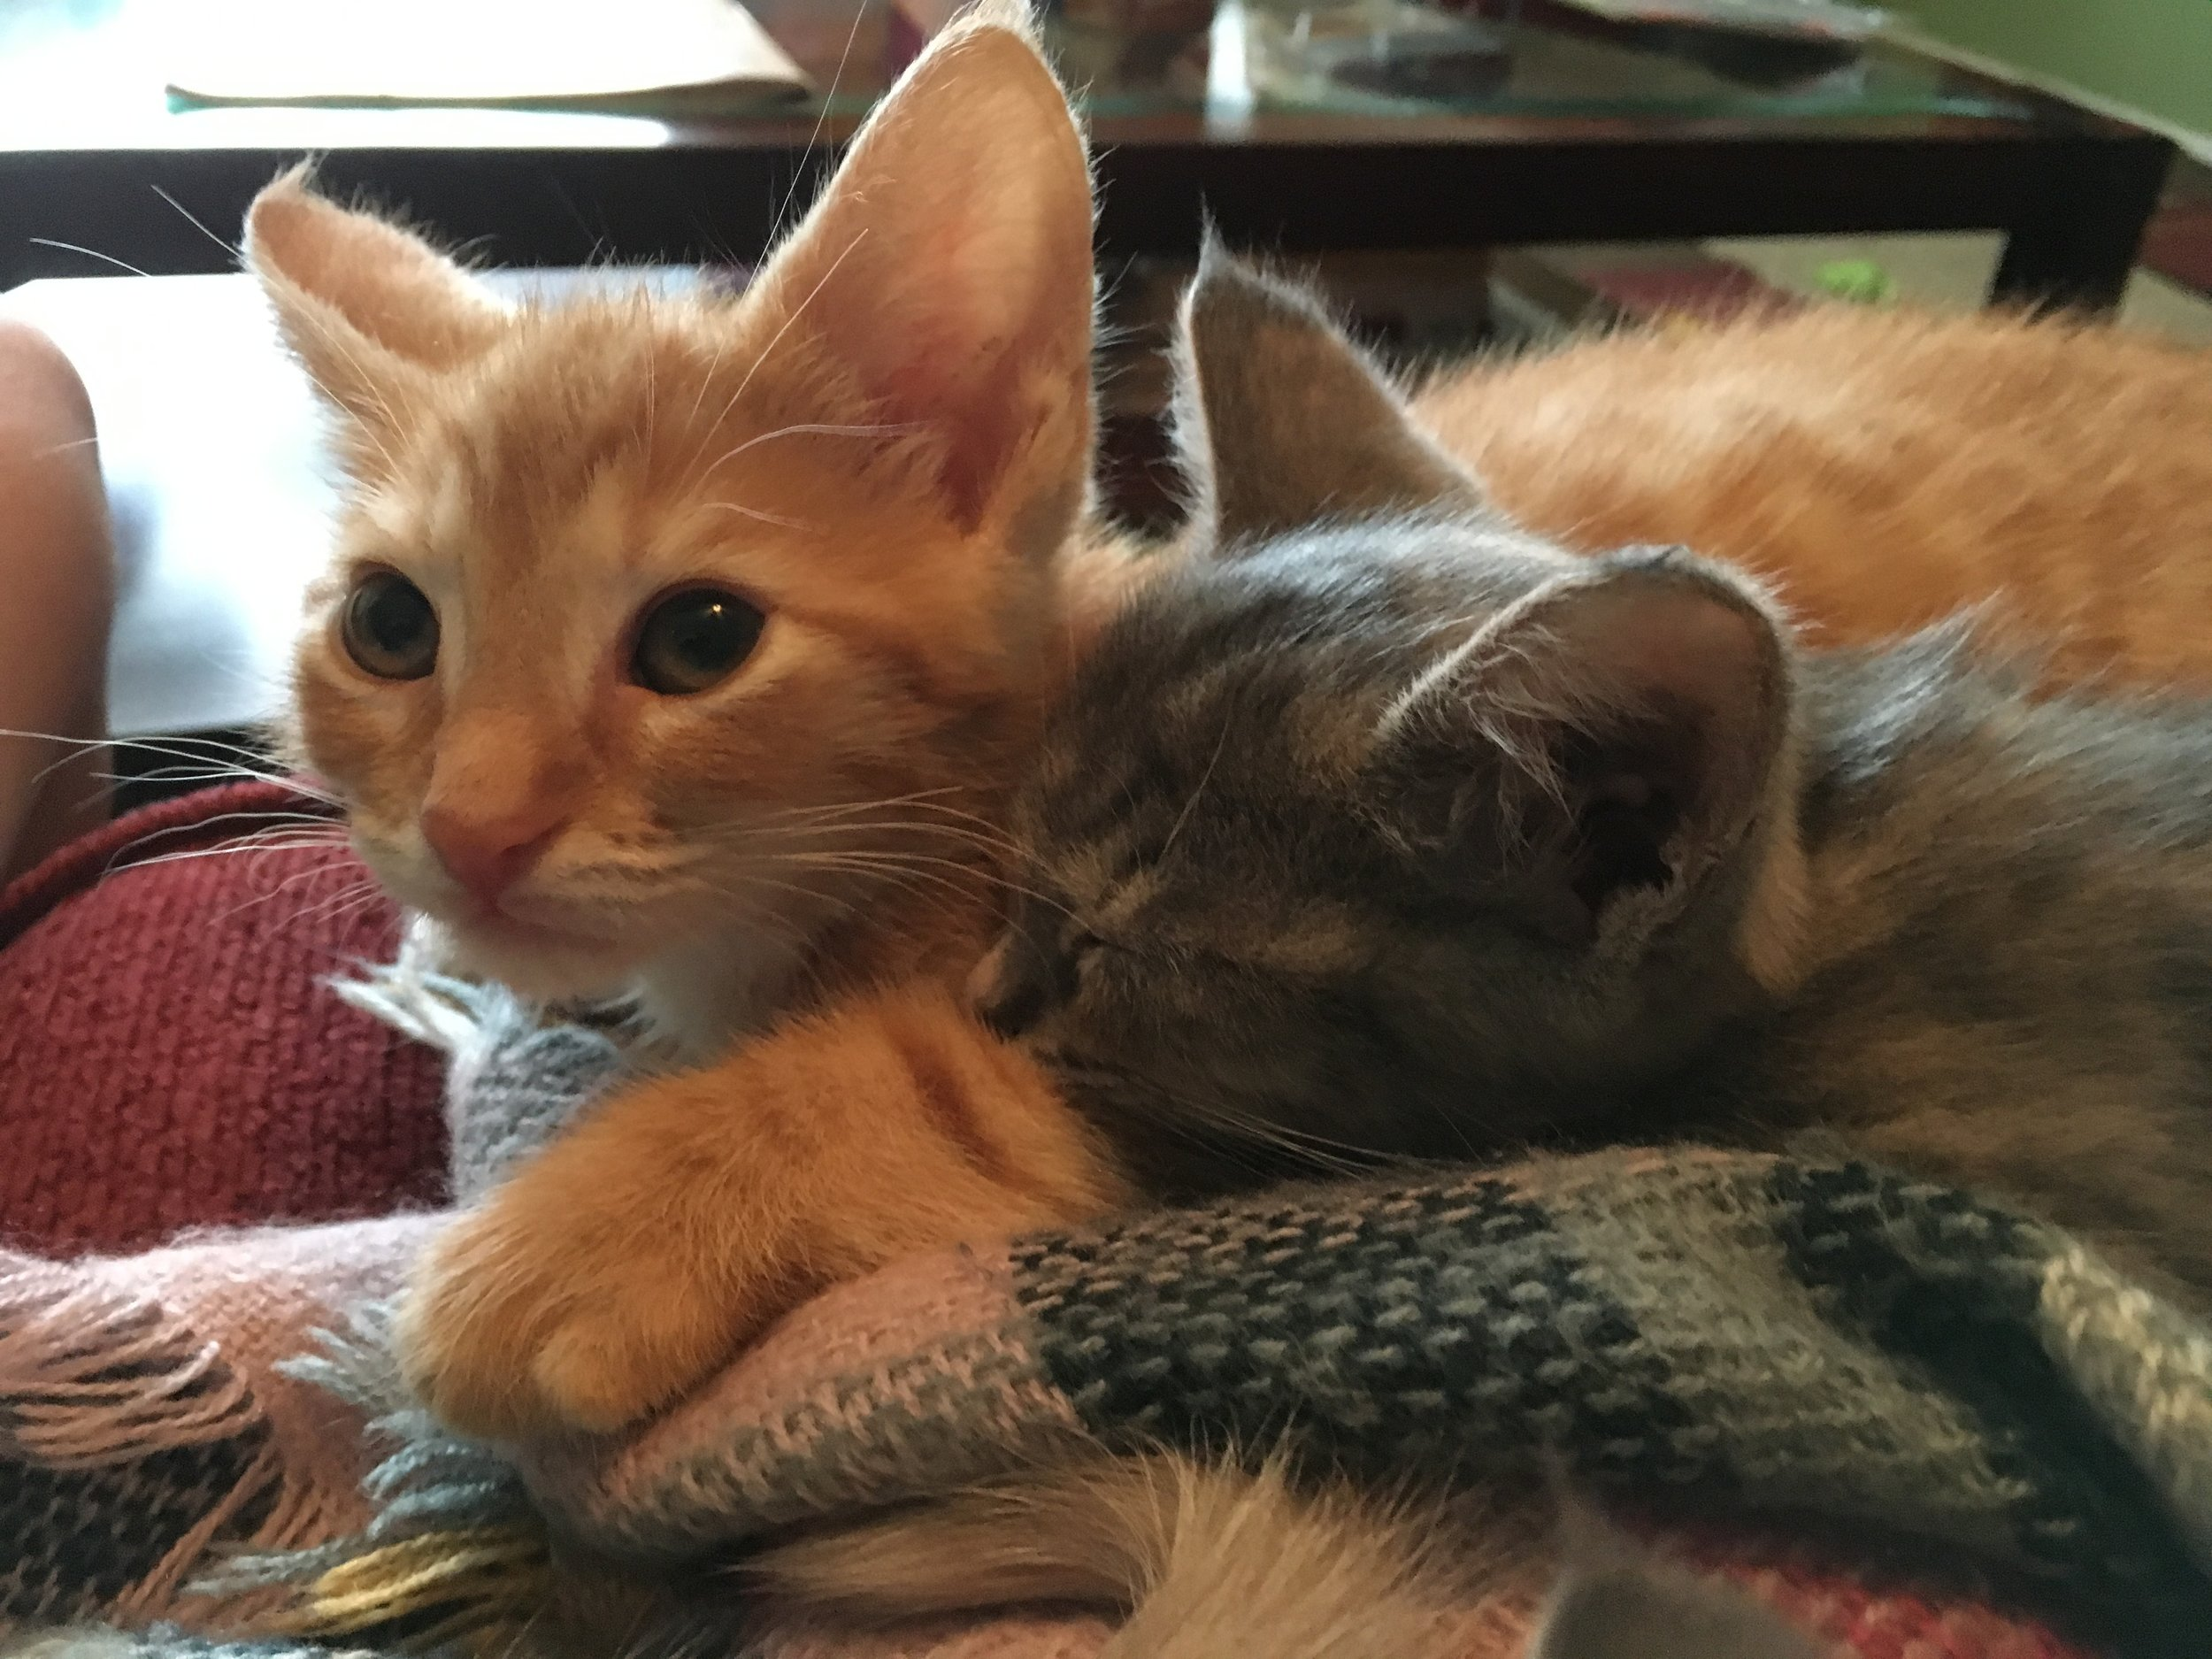 Cuddly kitties.JPG